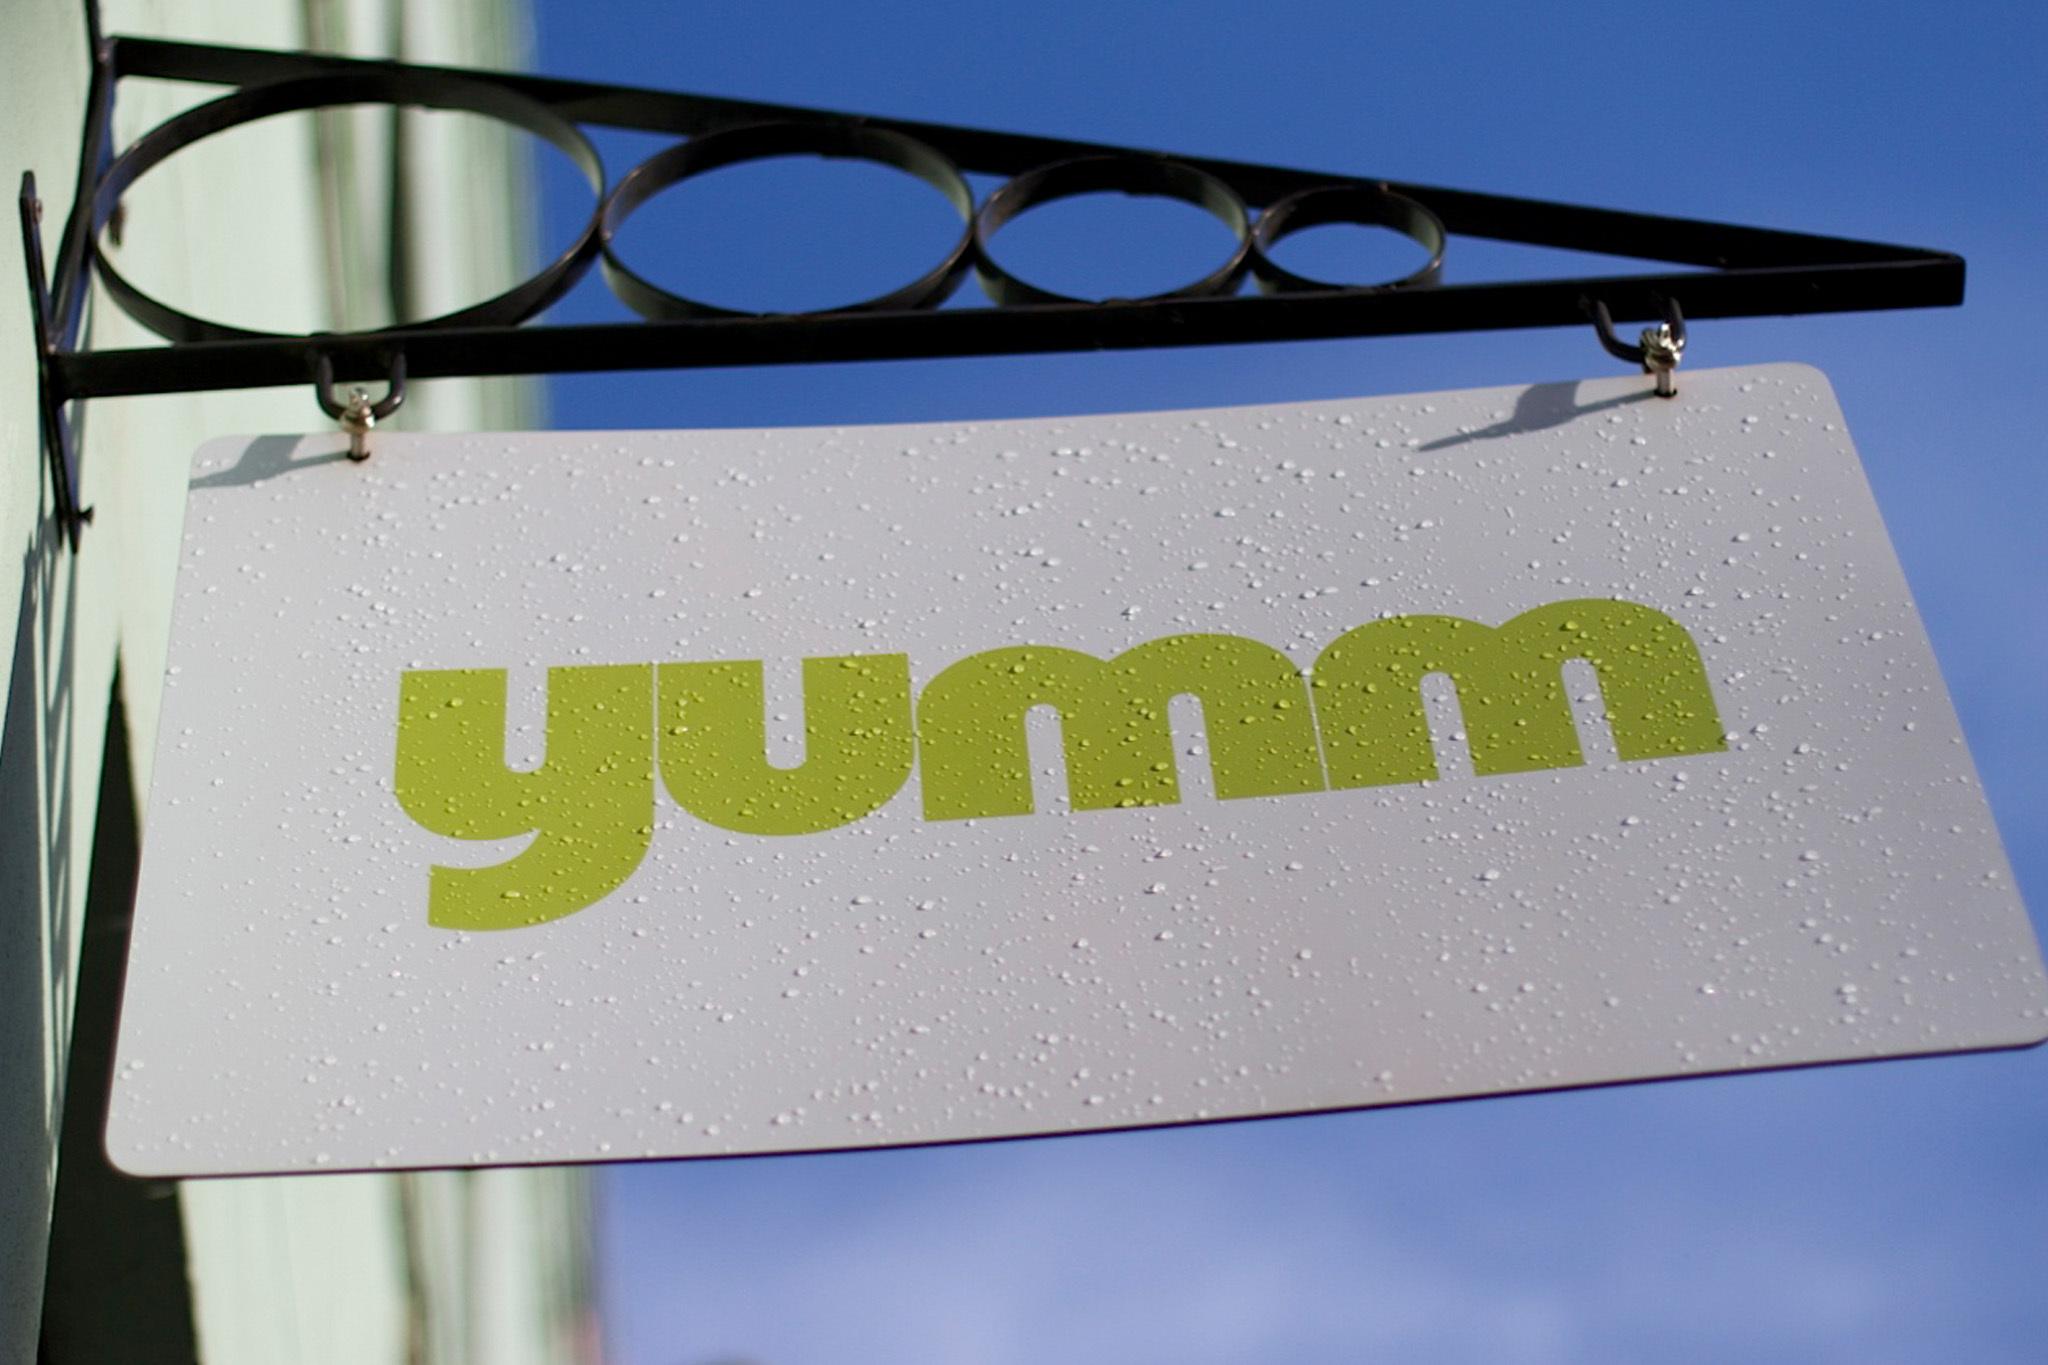 Yumm Cafe